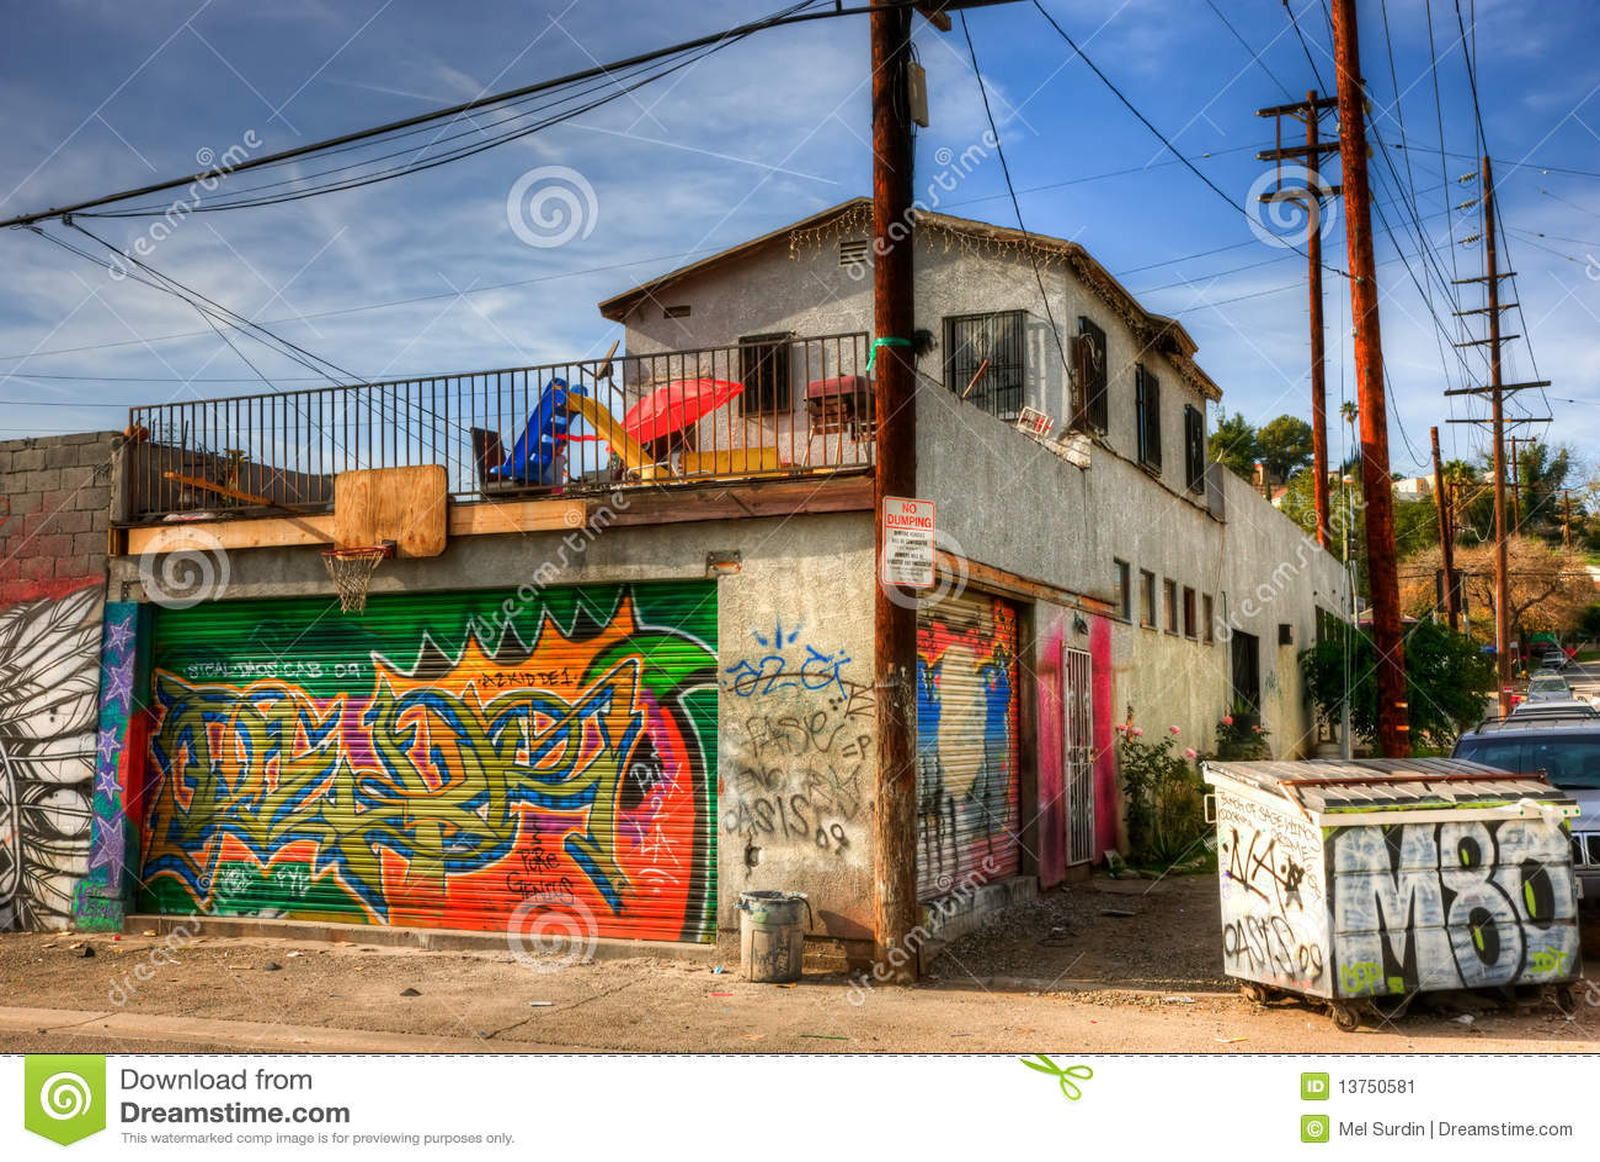 Graffiti East Los Angeles editorial photography. Image of american on jaime escalante, city terrace, los feliz, los angeles county, south los angeles, orange county, salton city, garfield high school, boyle heights, south gate, downtown los angeles, american me, monterey park, california, silver lake,